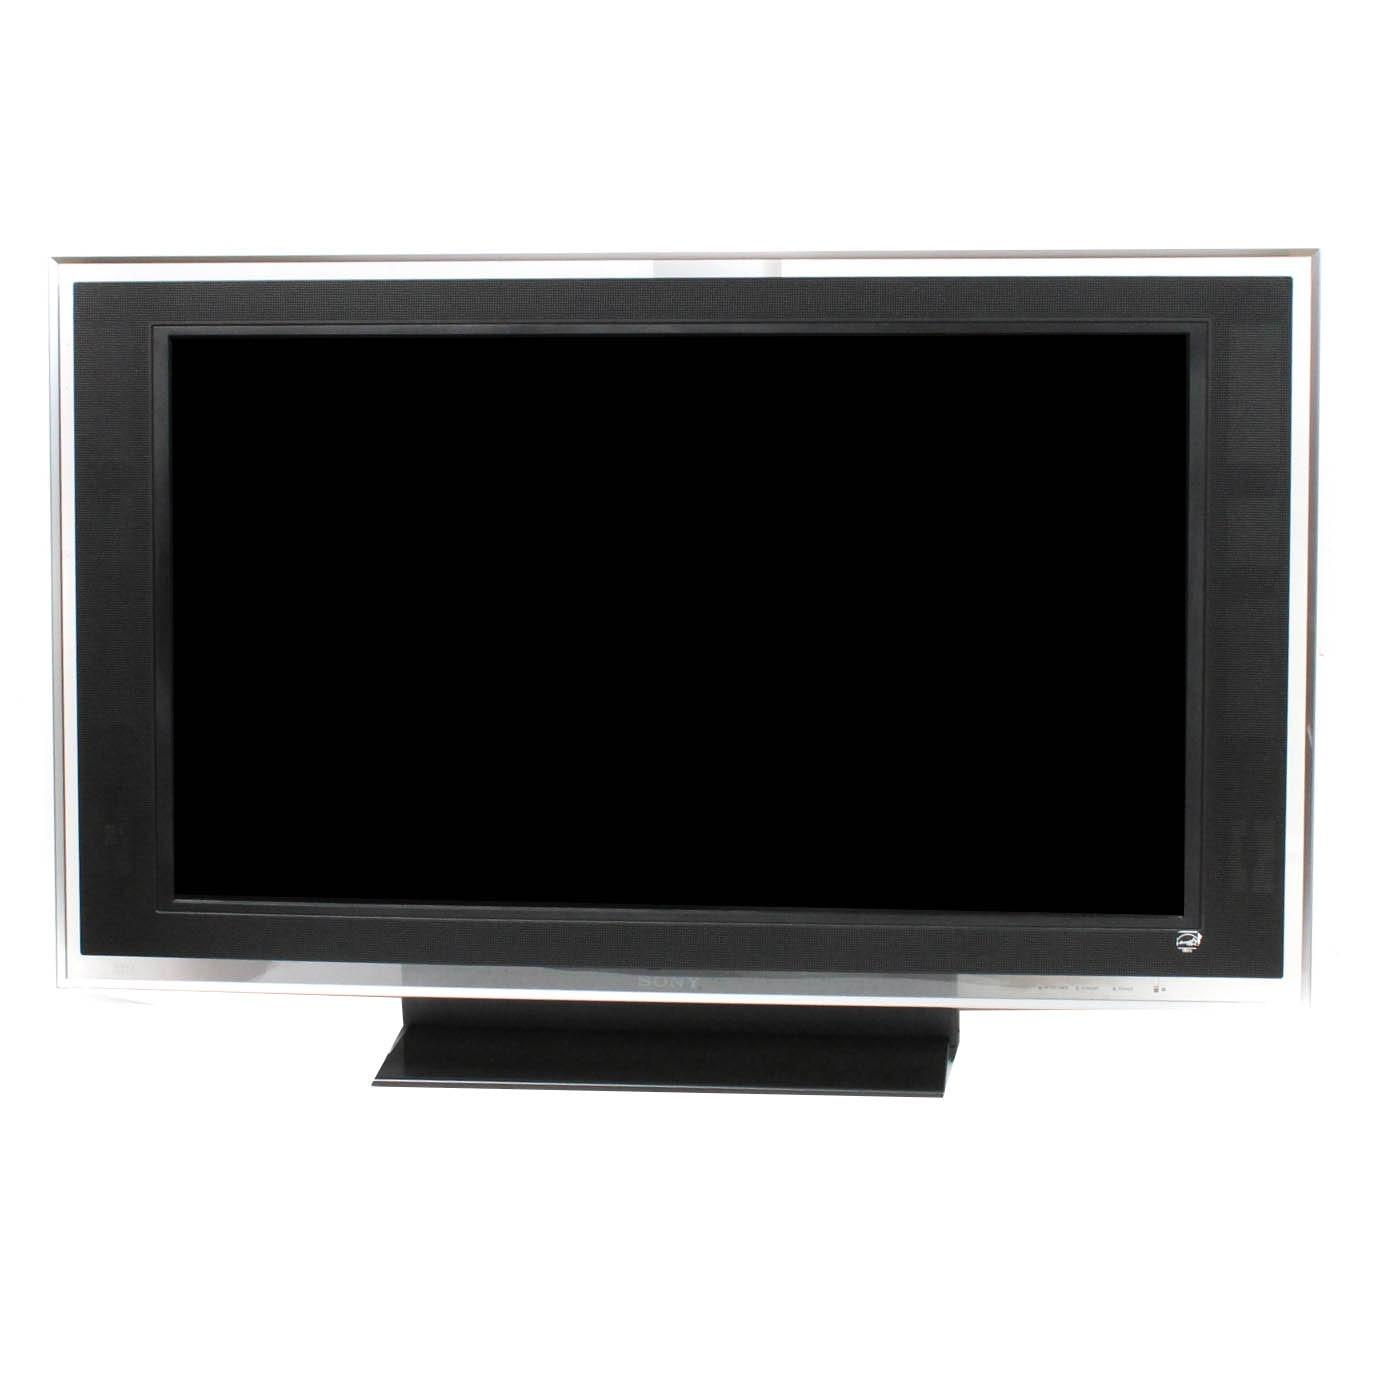 "Sony Bravia 40"" Flat Screen TV"